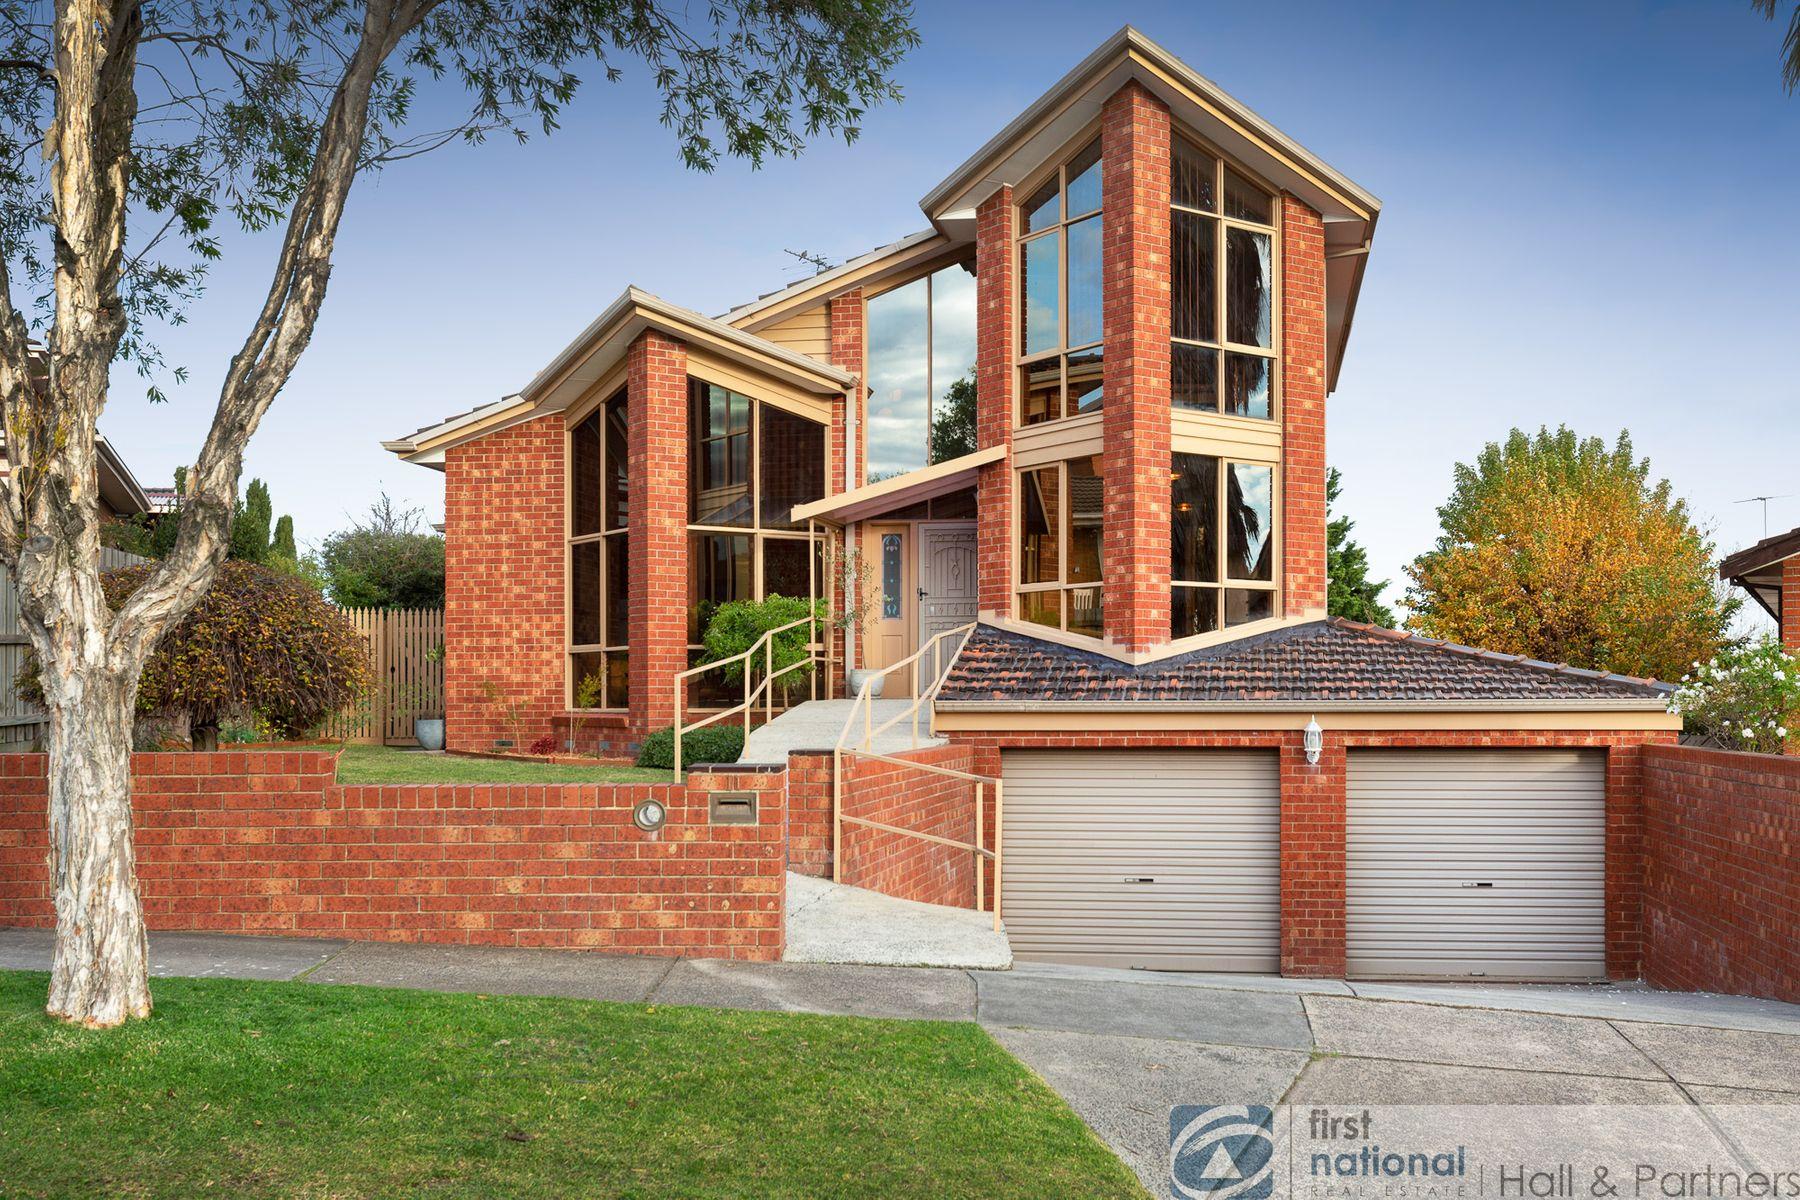 11 Freeman Court, Endeavour Hills, VIC 3802